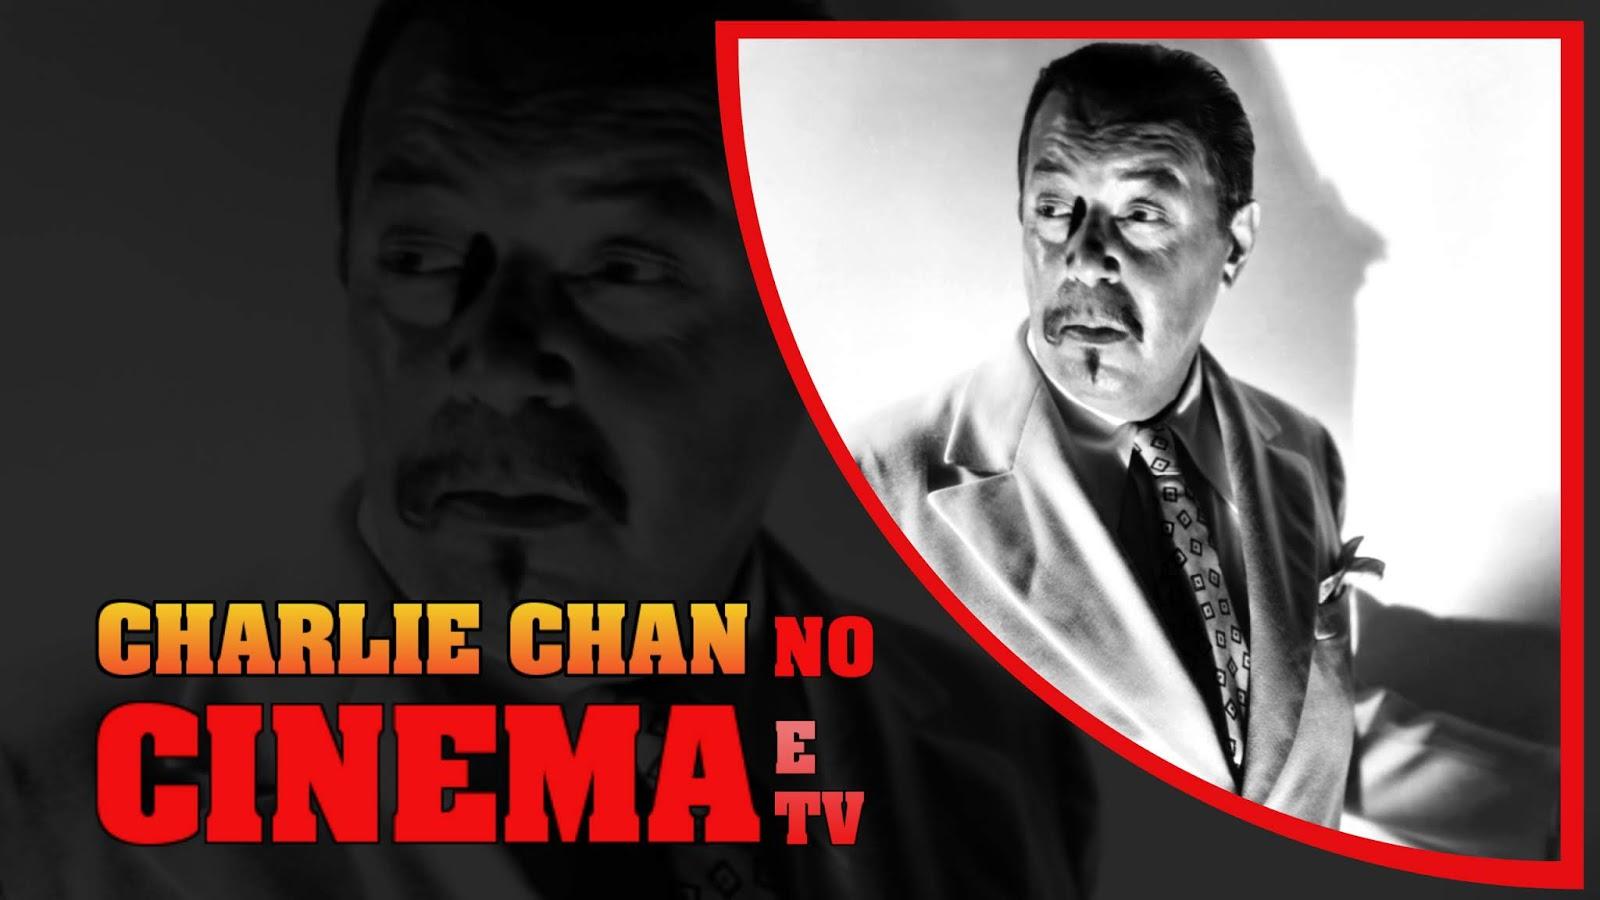 charlie-chan-no-cinema-tv.